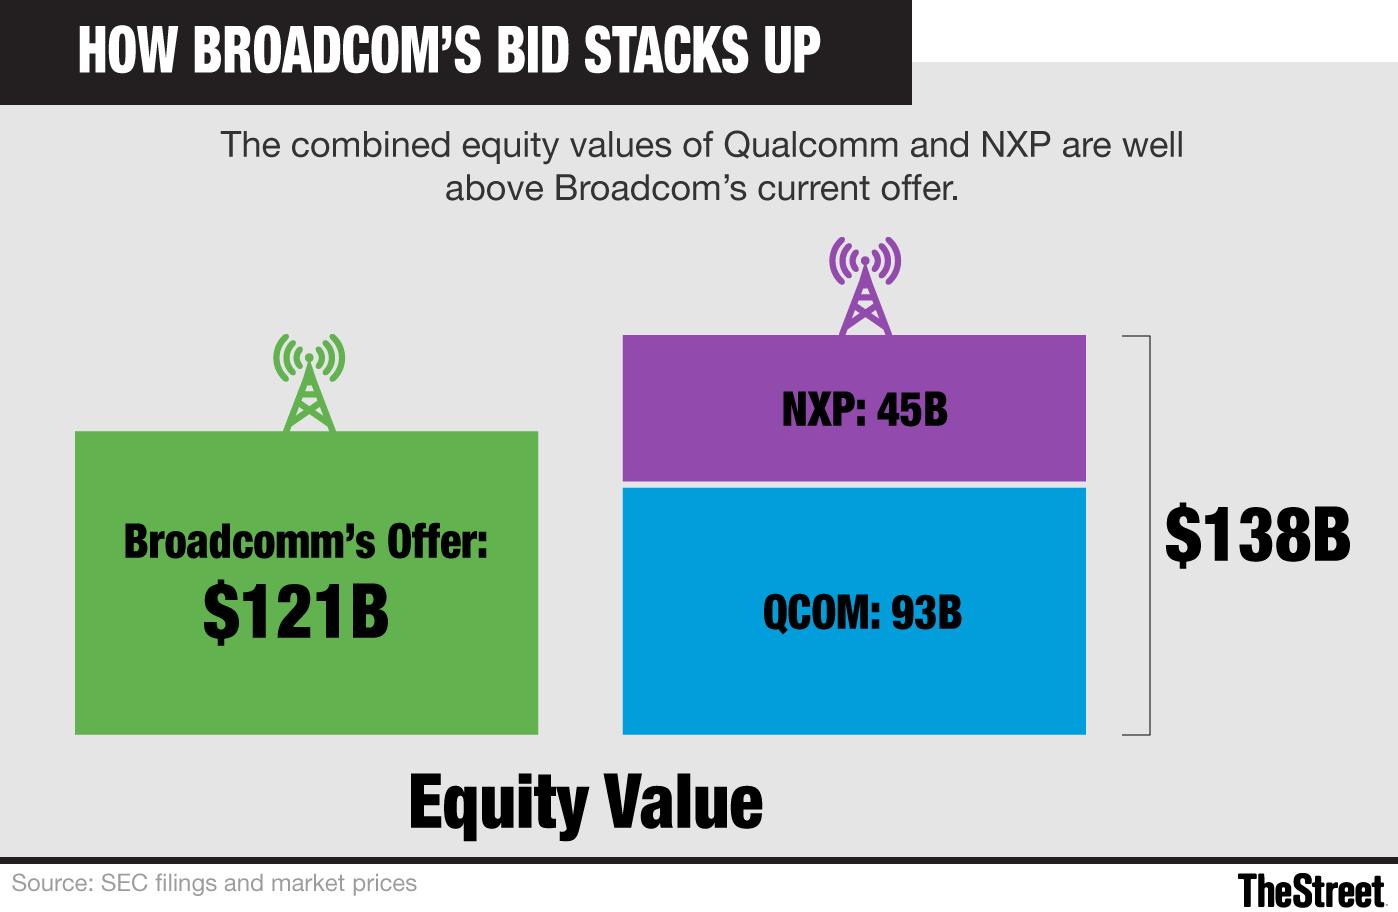 What Will Be Broadcom's (NASDAQ:AVGO) Next Move? - TheStreet